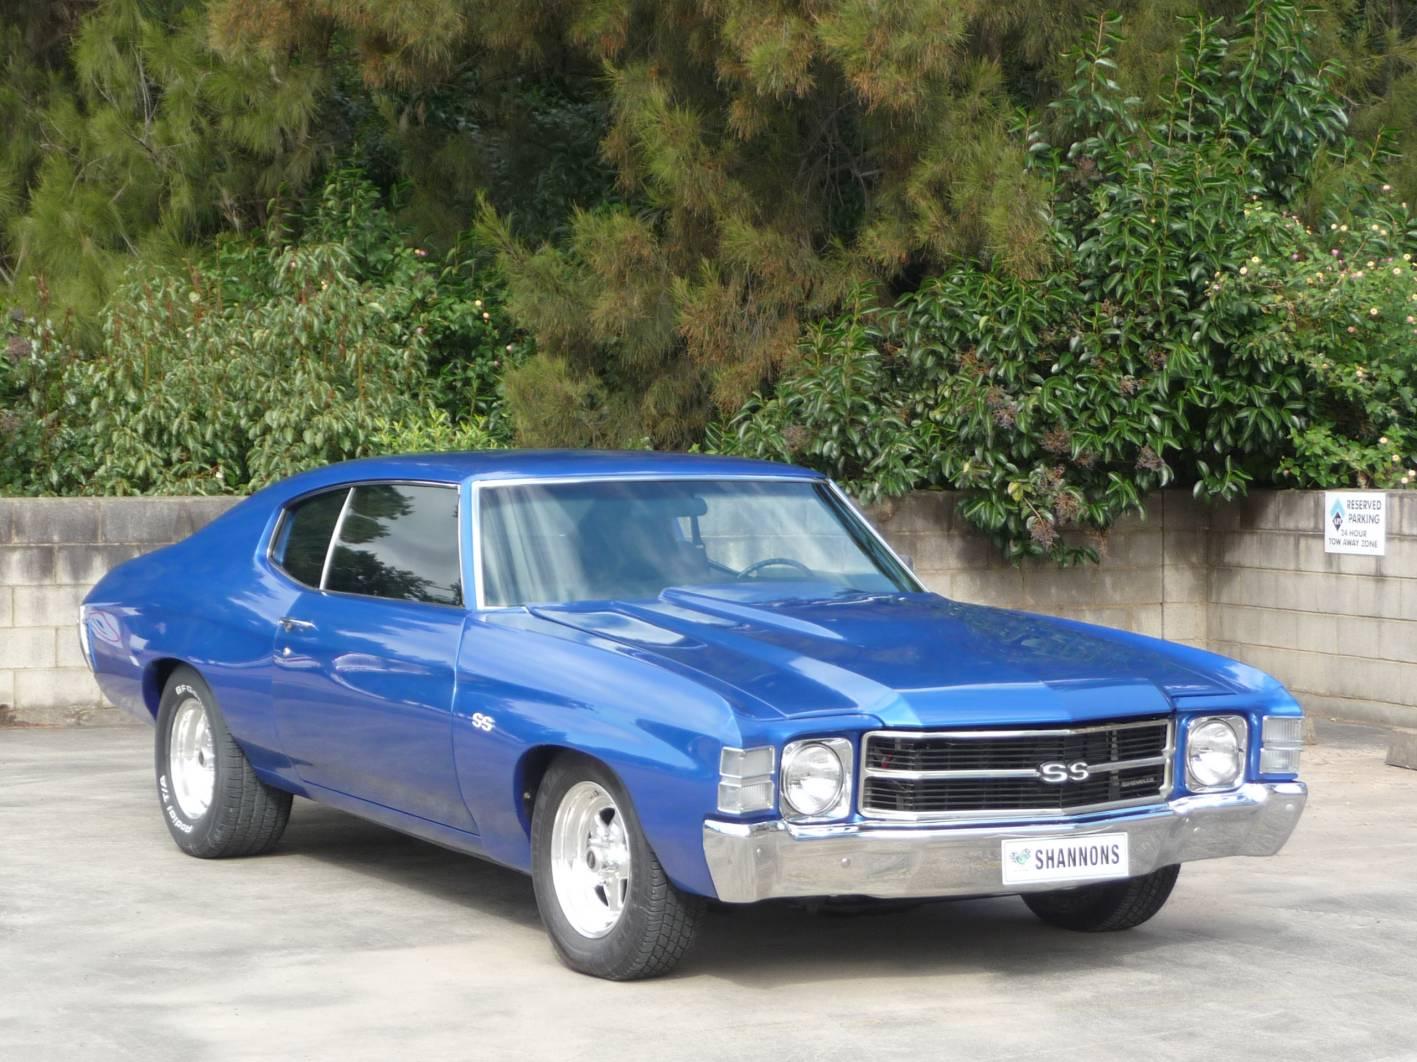 1972 Chevrolet Chevelle Coupe SS MotorEx - PerformanceDrive